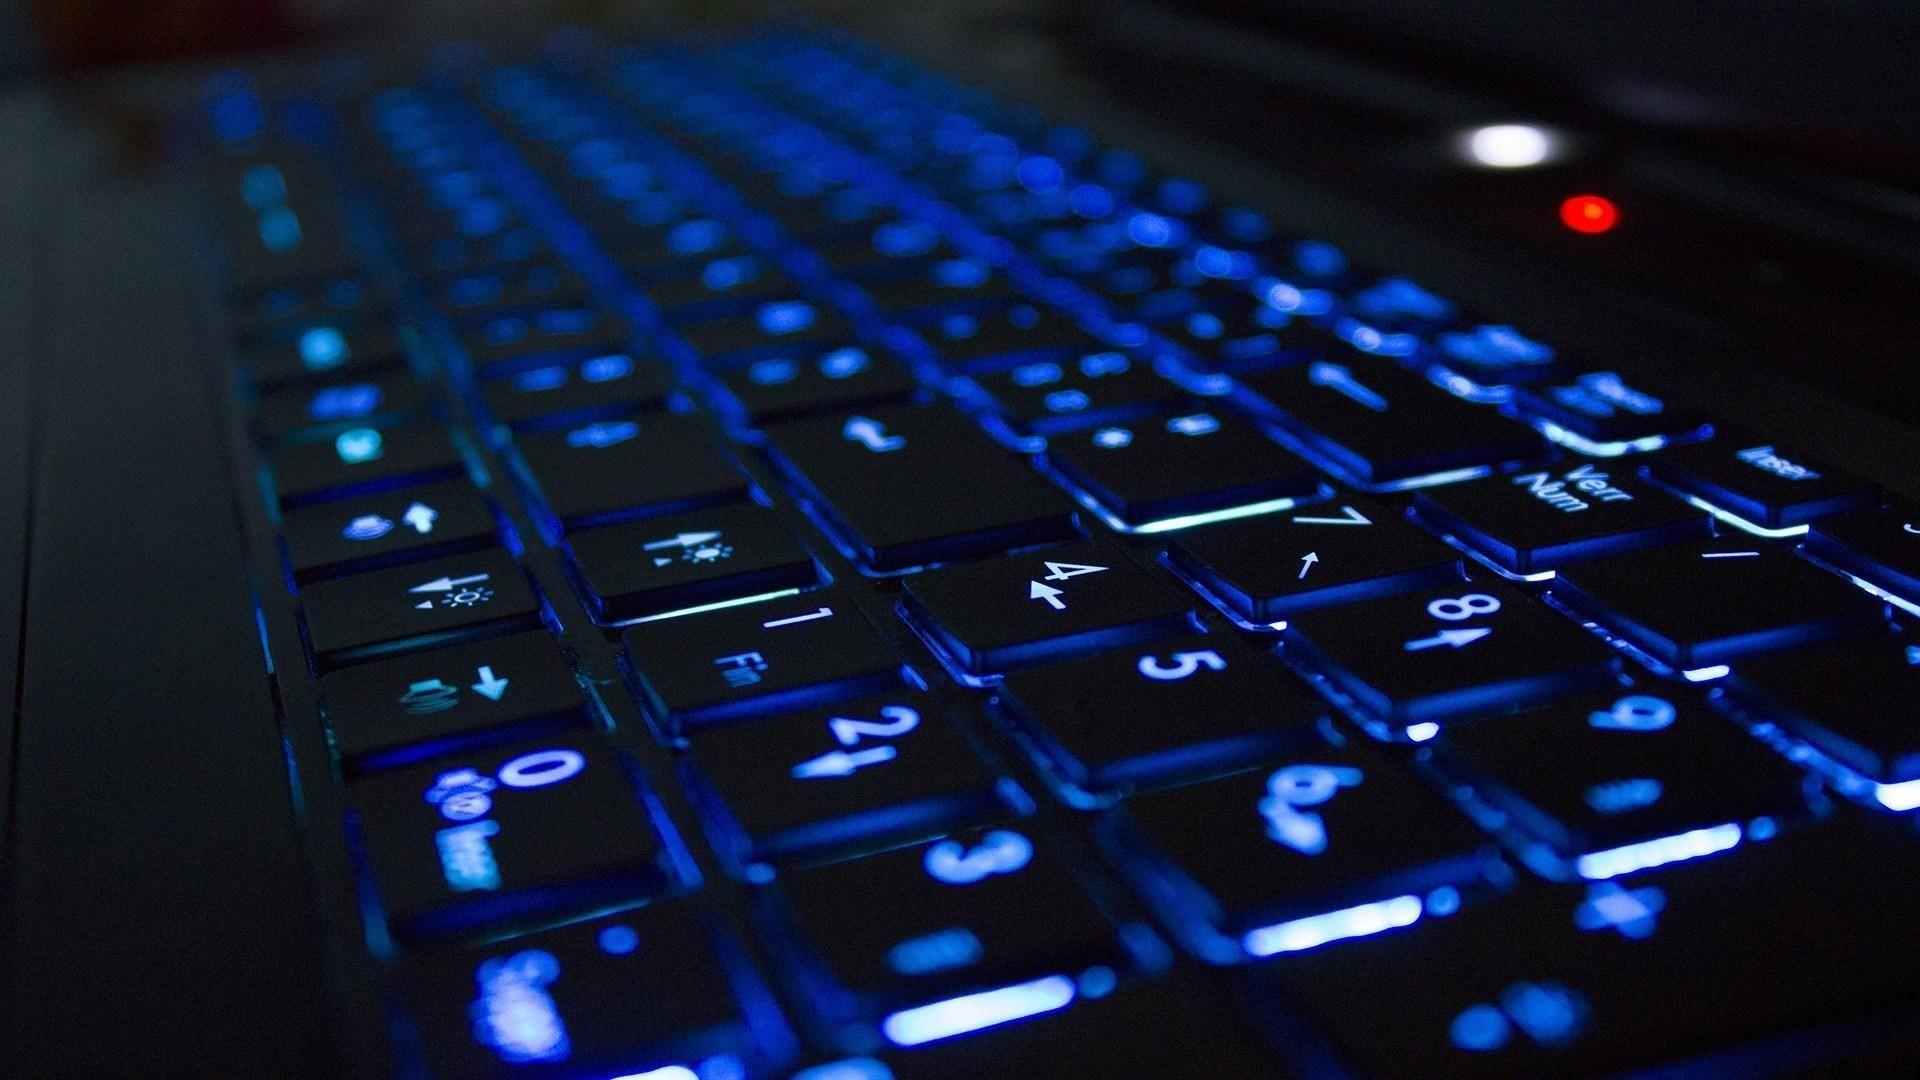 Hi Tech Keyboard Hd Wallpaper Freehdwalls